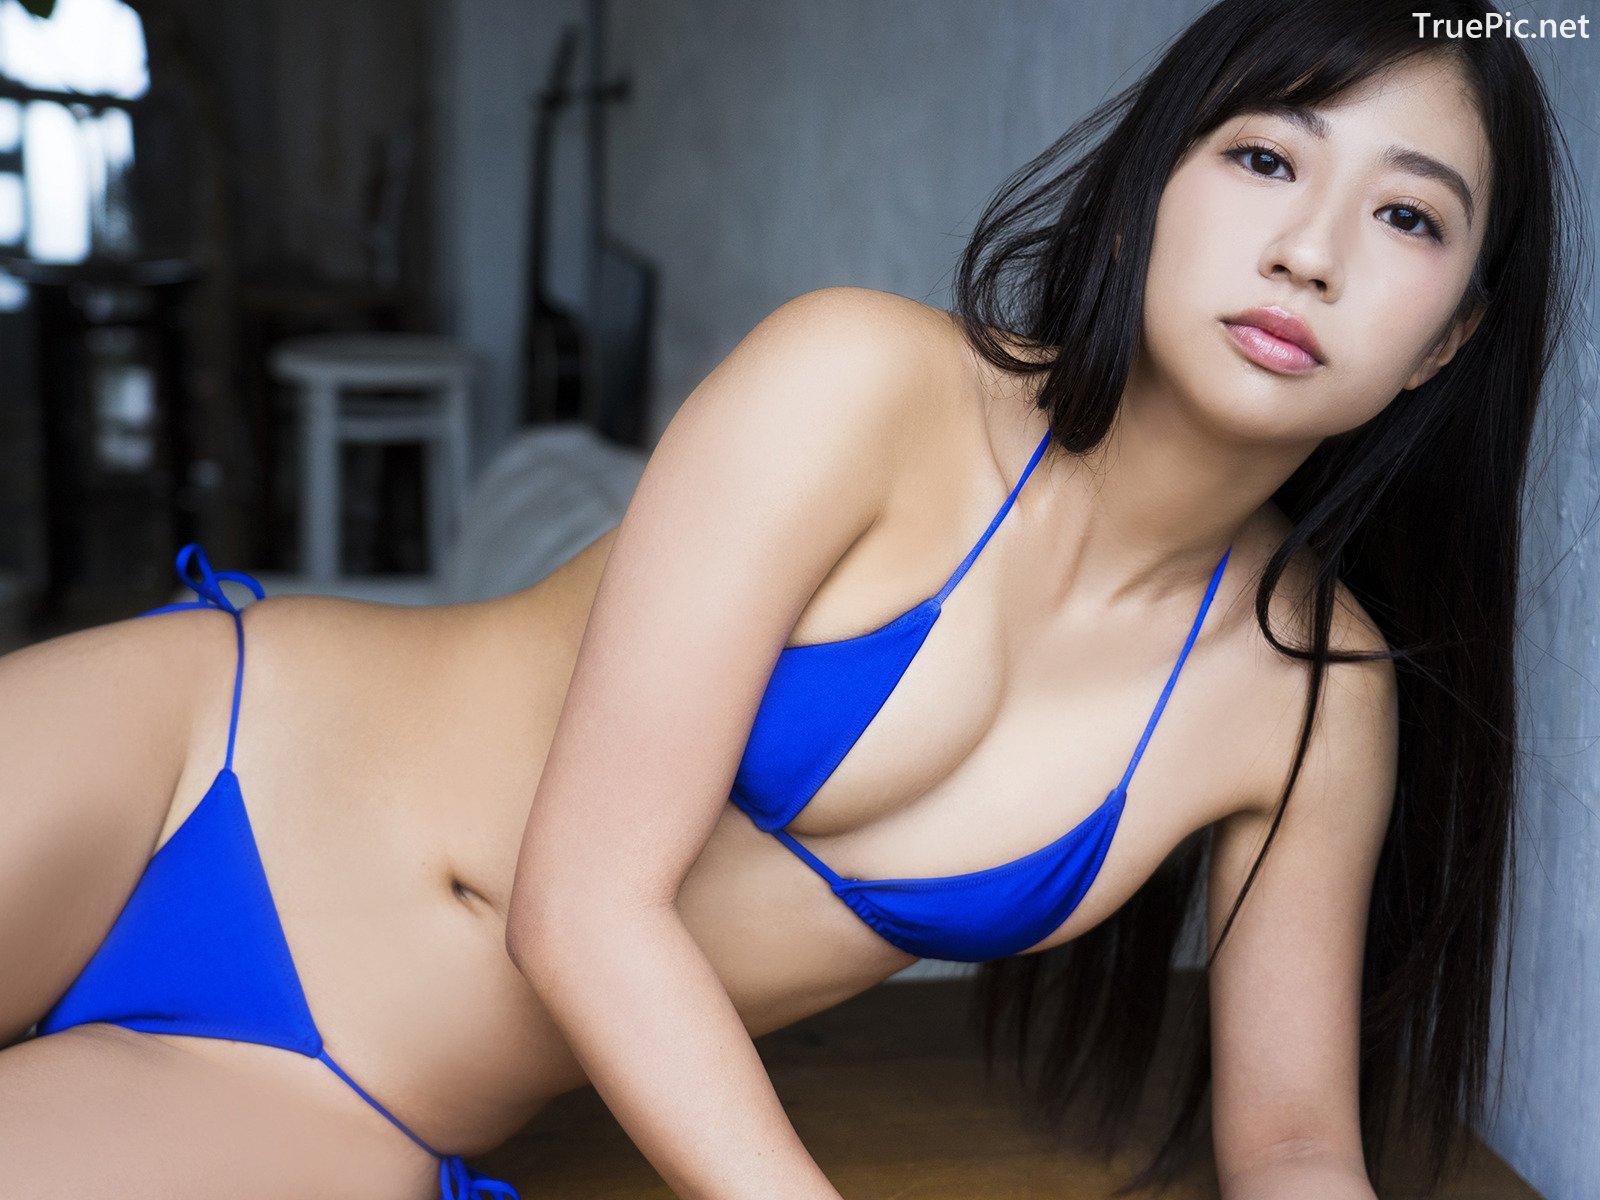 Image Japanese Gravure Model - Sayaka Ohnuki - Maiden Love Story - TruePic.net - Picture-39